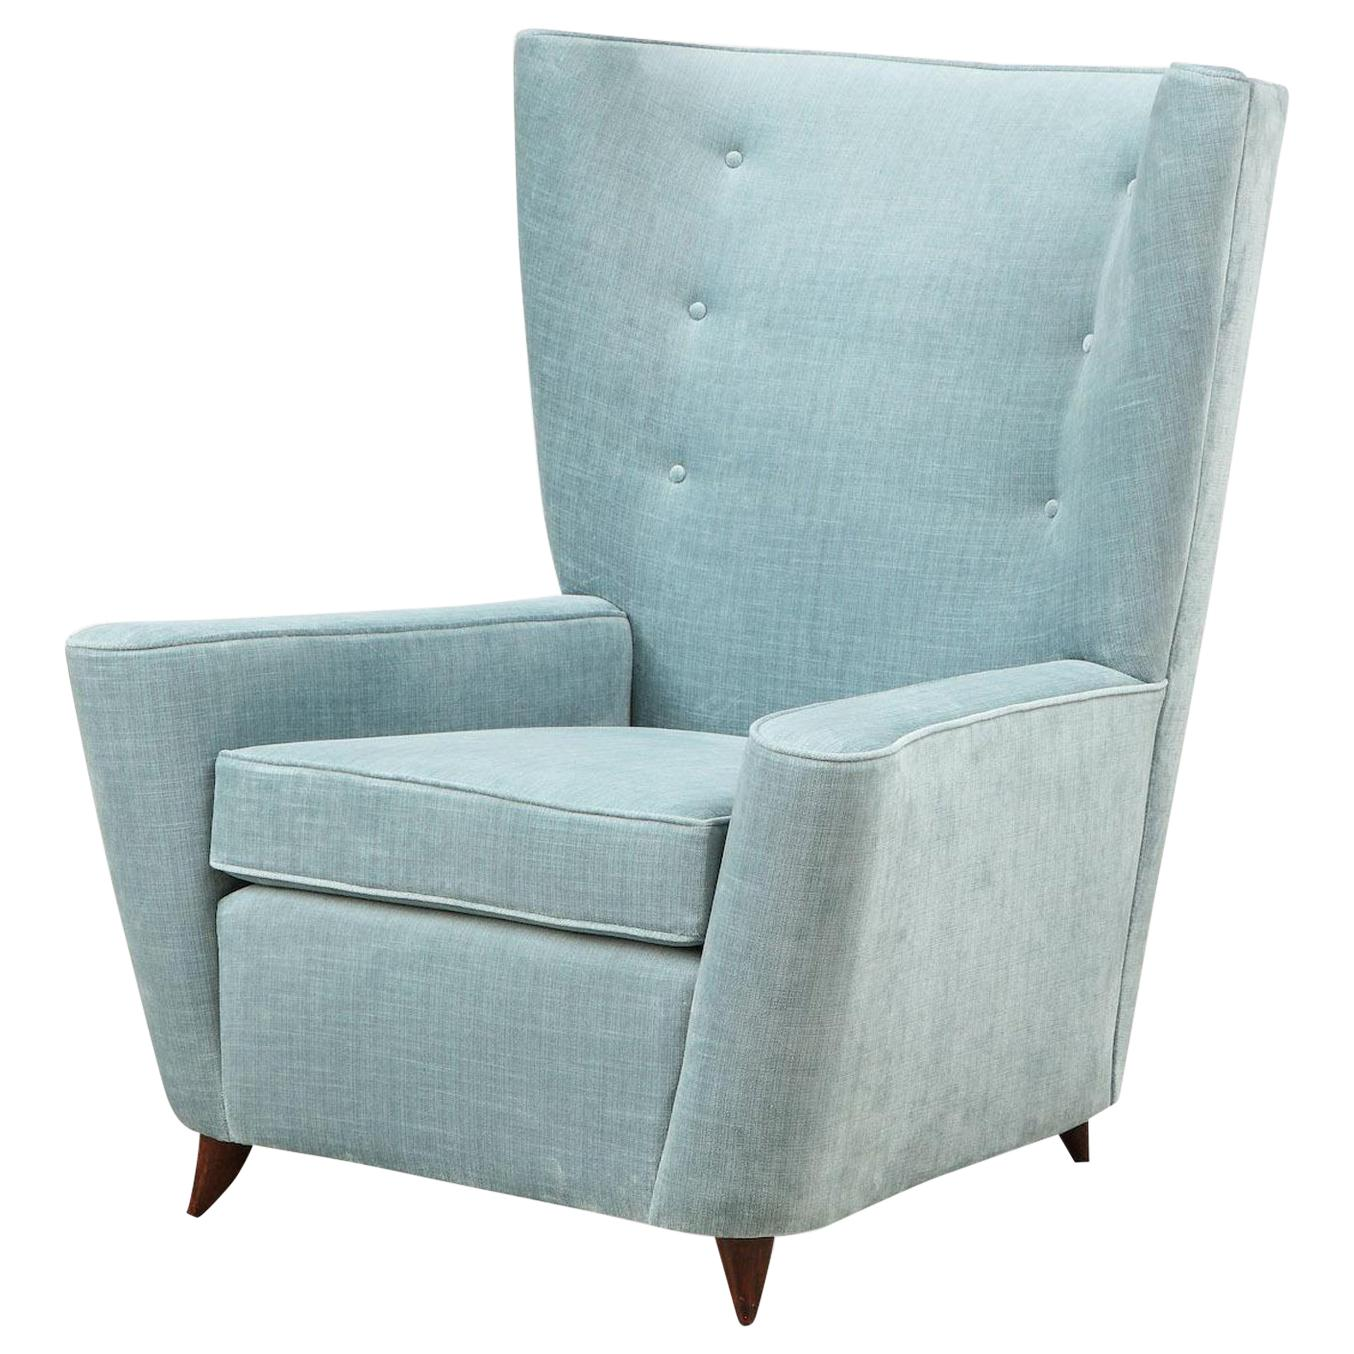 Rare Lounge Chair by Paolo Buffa